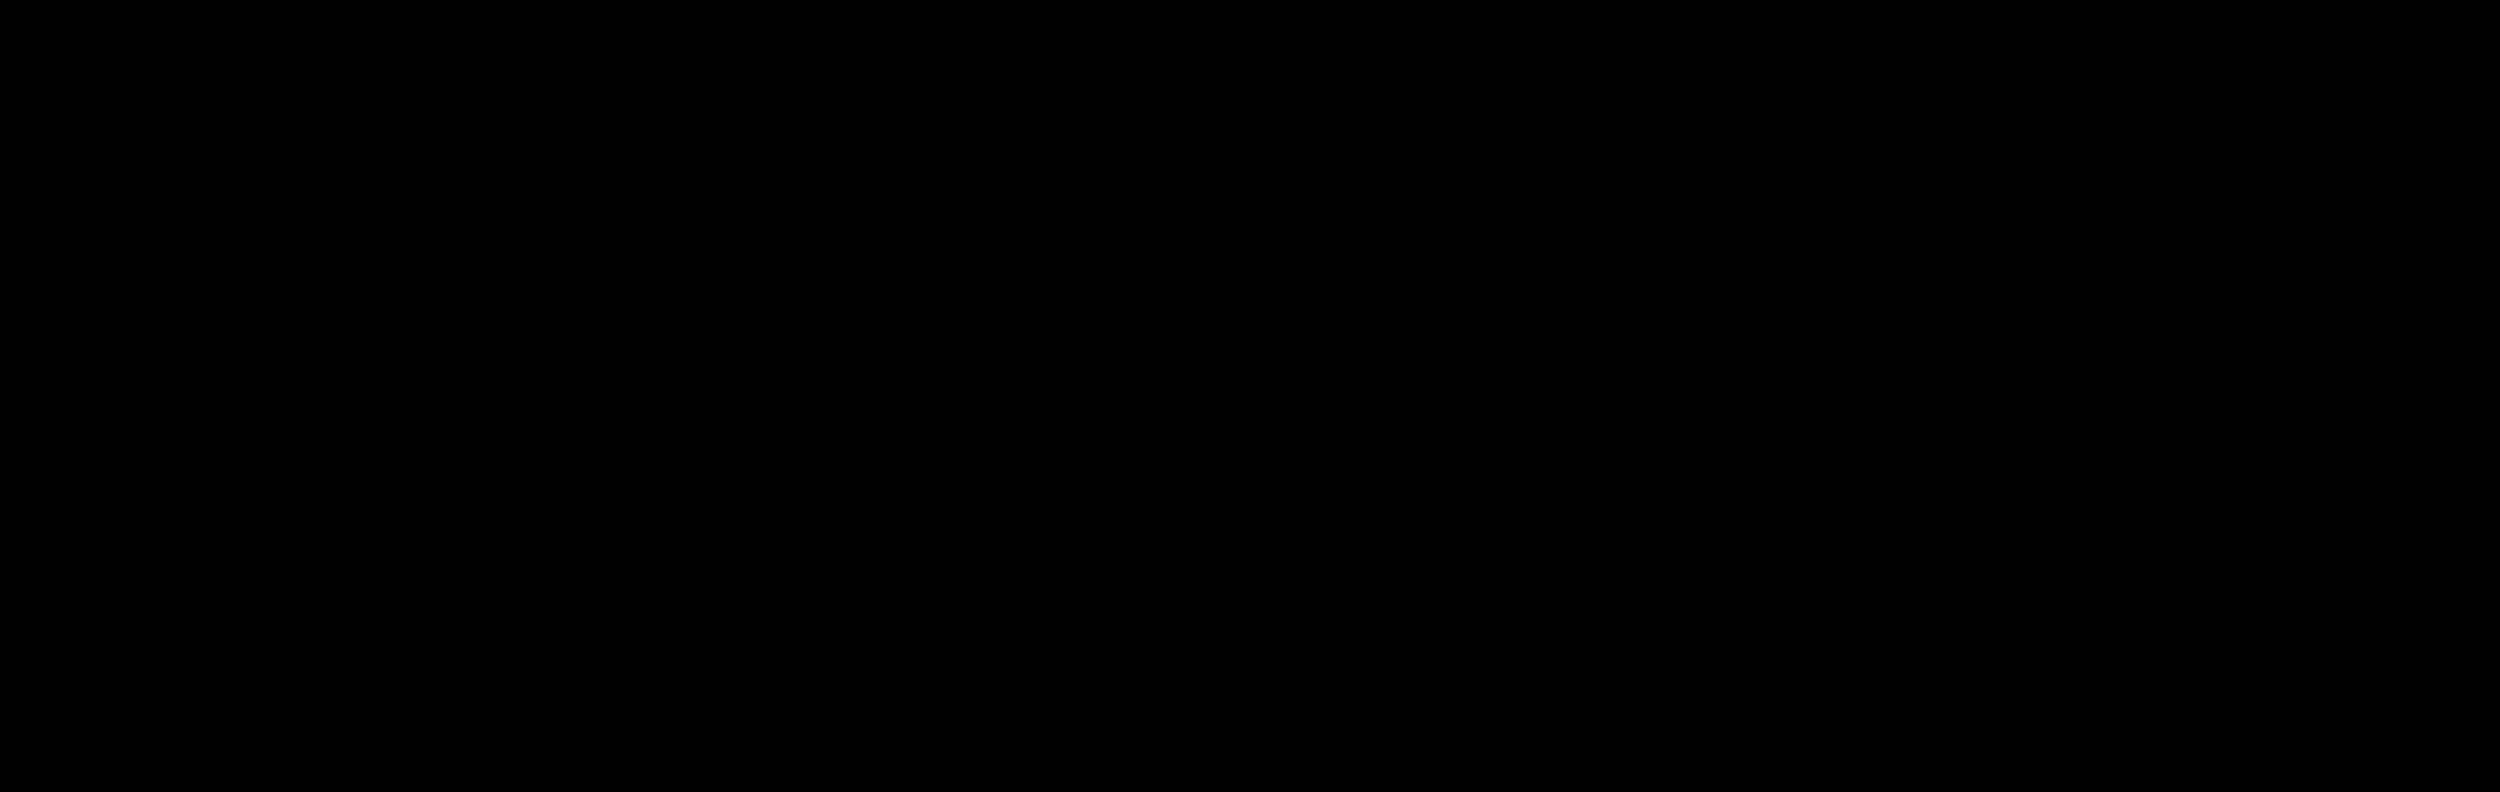 FFFPrimary-Logo_black.png